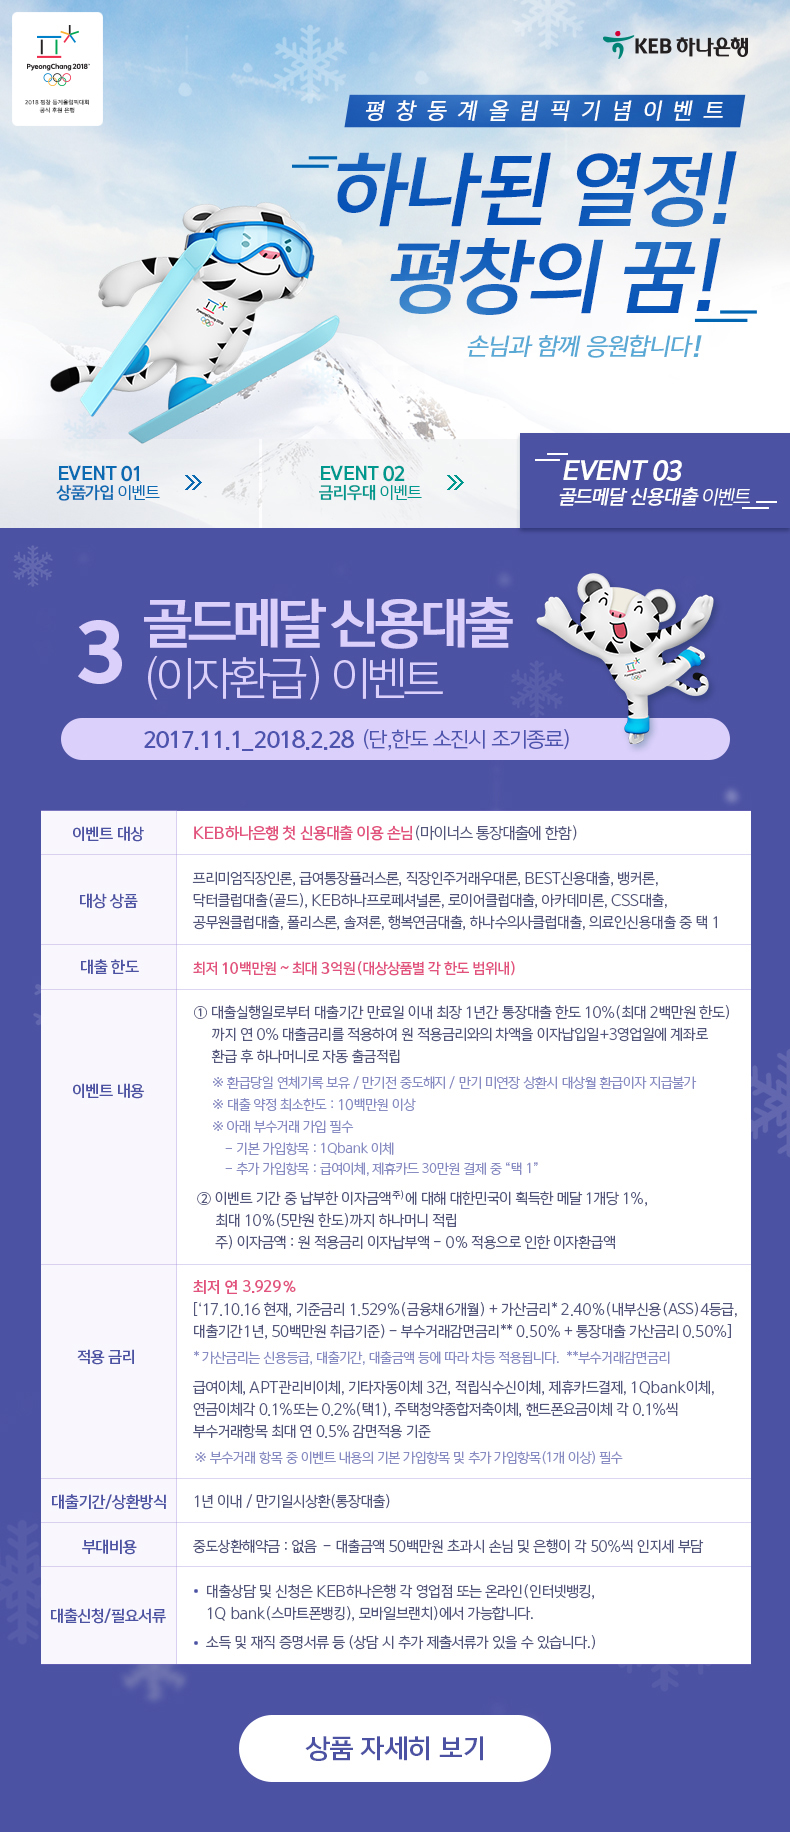 EVENT 03 골드메달 신용대출(이자환급) 이벤트